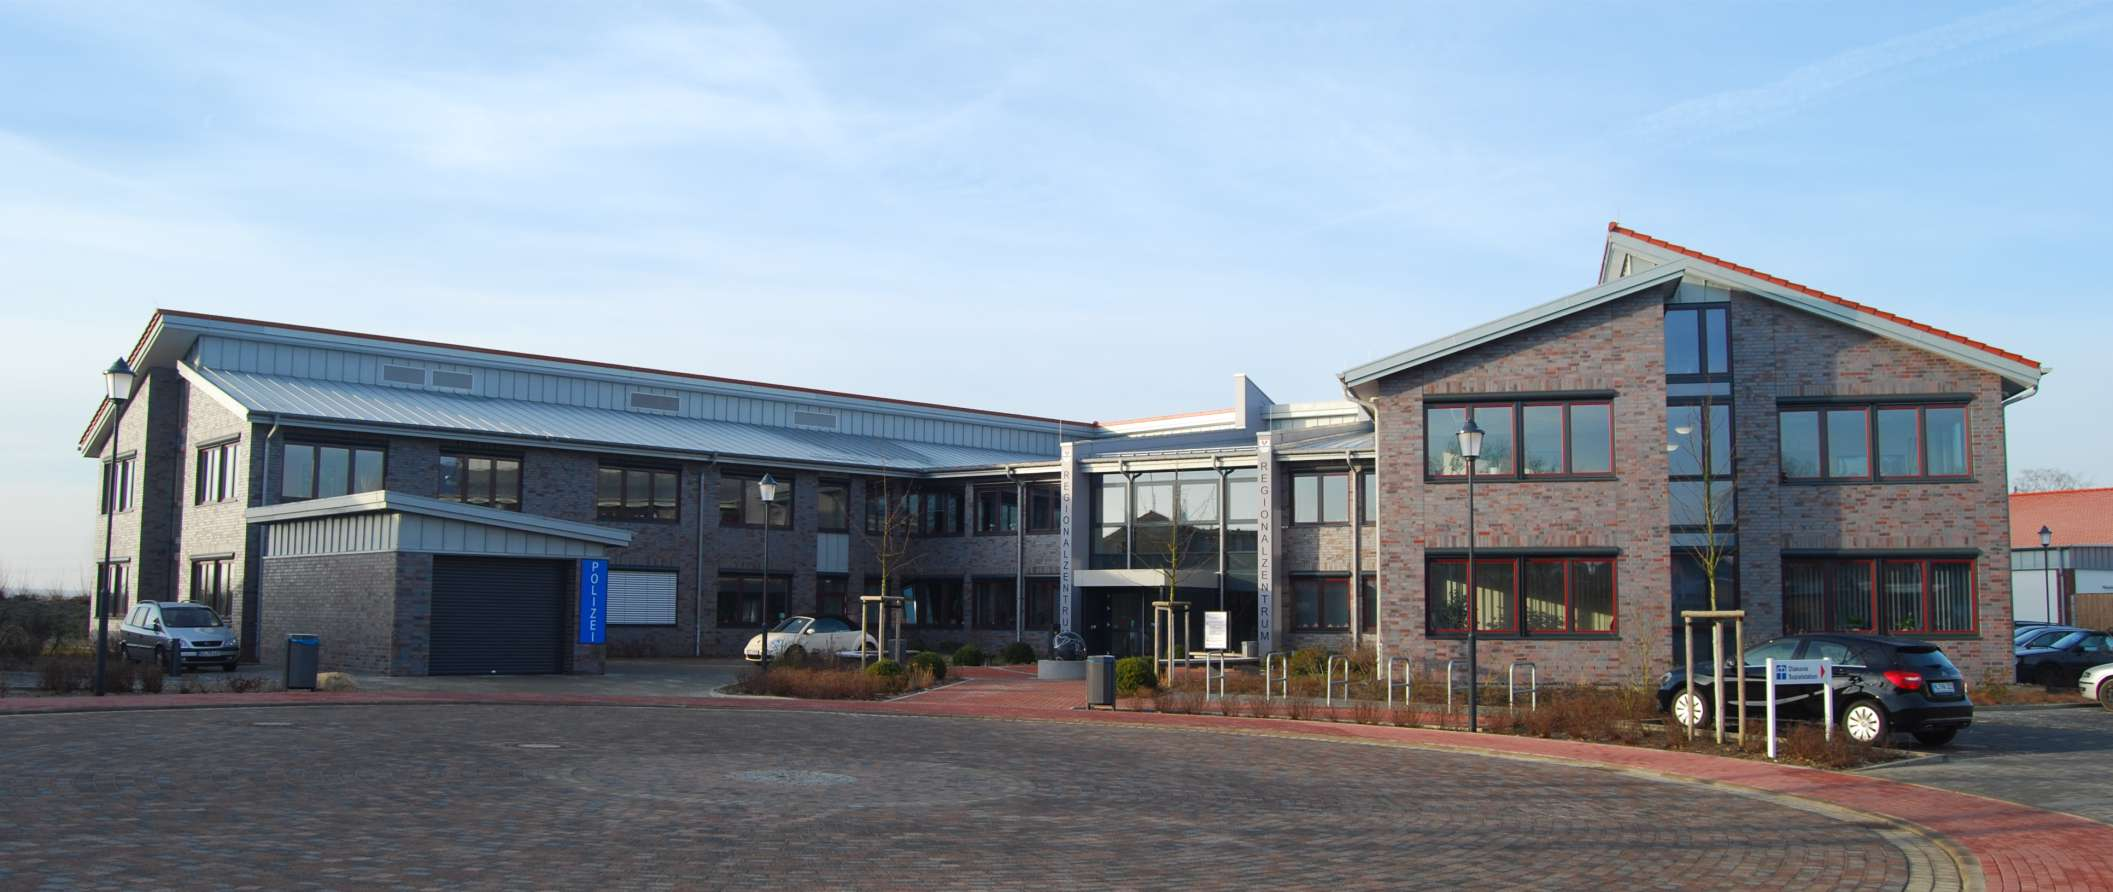 Regionalzentrum Sandesneben